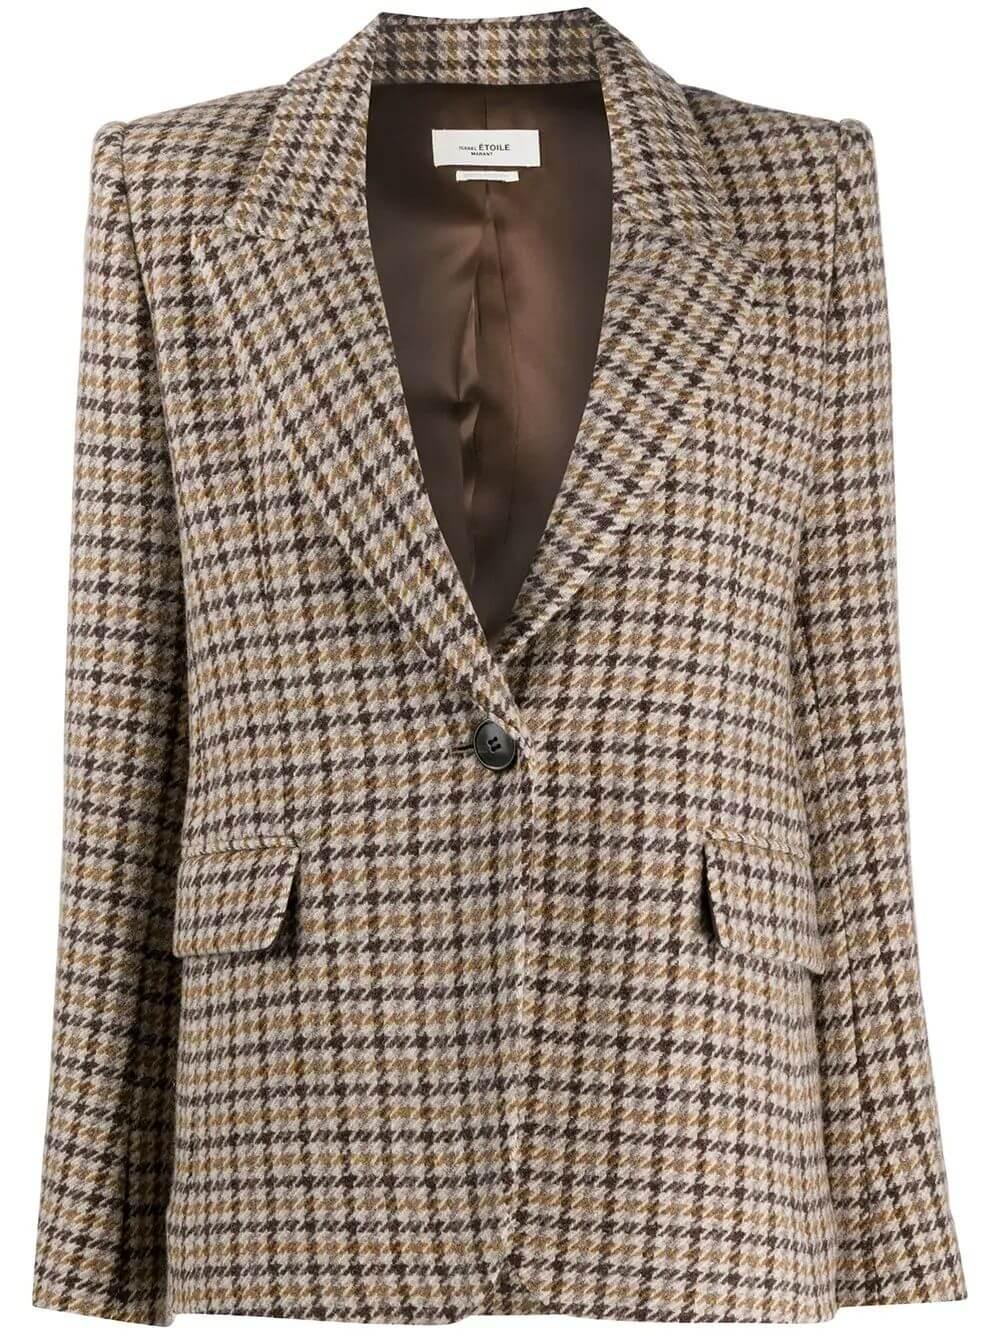 Kerstin Houndstooth Jacket Item # 20AVE1359-20A025E